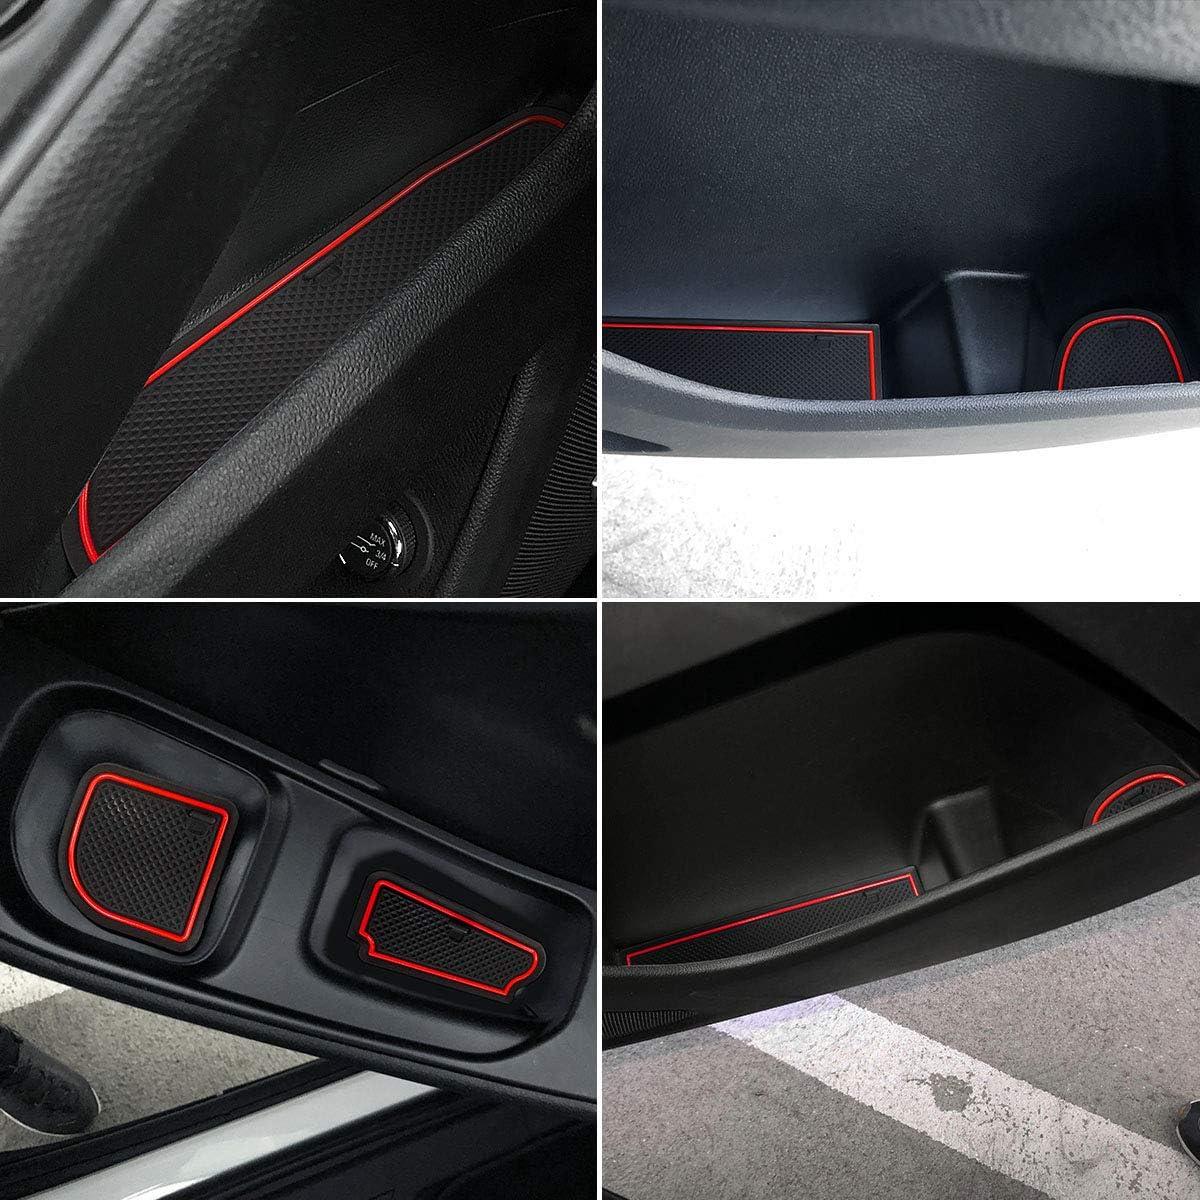 2010 Chrysler 300 Sedan Red Oriental Driver Passenger /& Rear Floor 2008 2006 2007 GGBAILEY D4460A-S1A-RD-IS Custom Fit Car Mats for 2005 2009